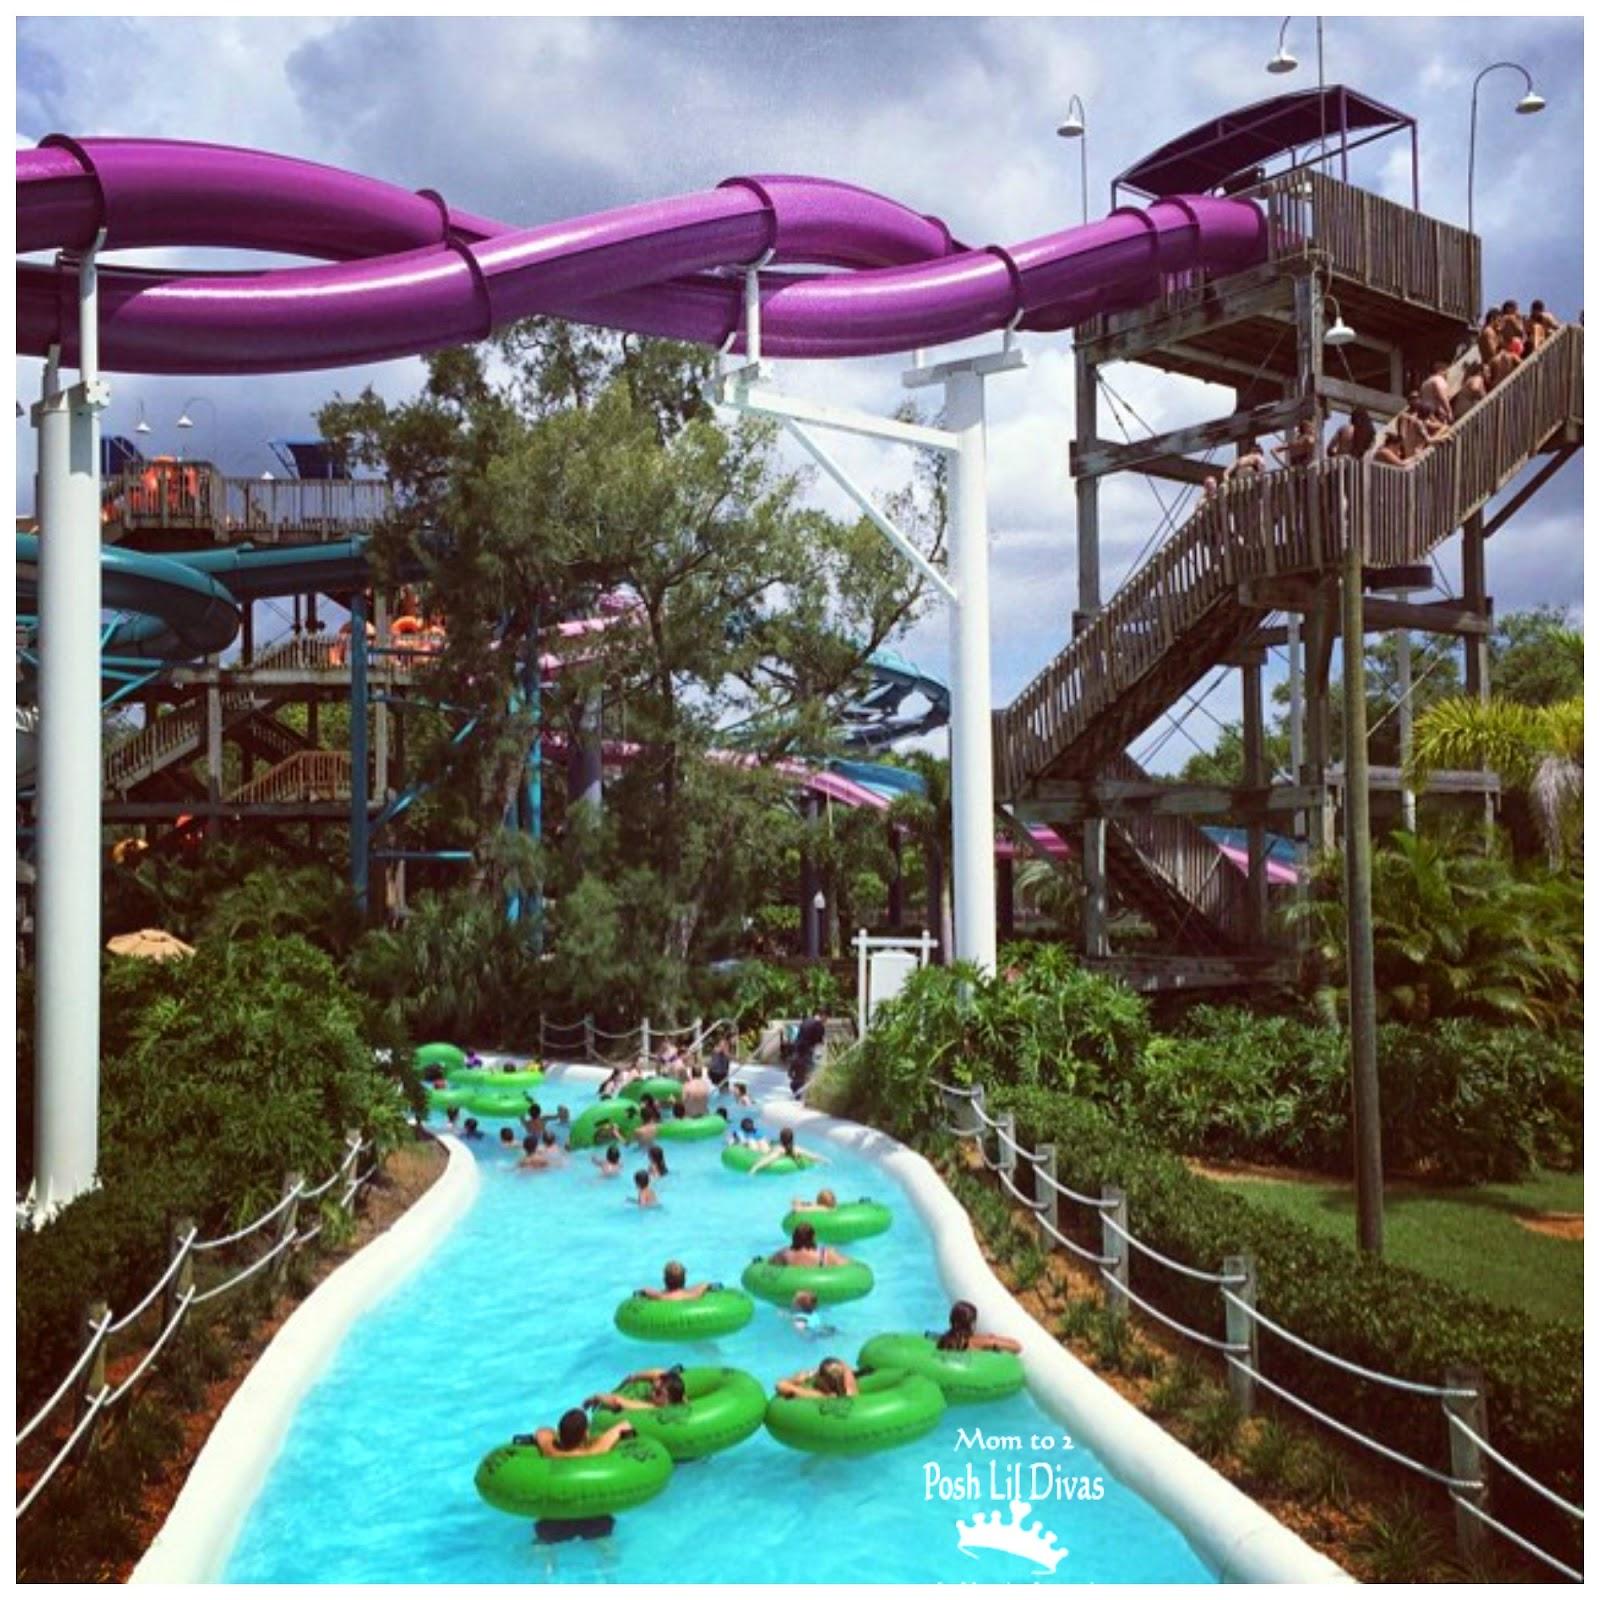 Adventure island water park fun tampa florida Busch gardens tampa water park